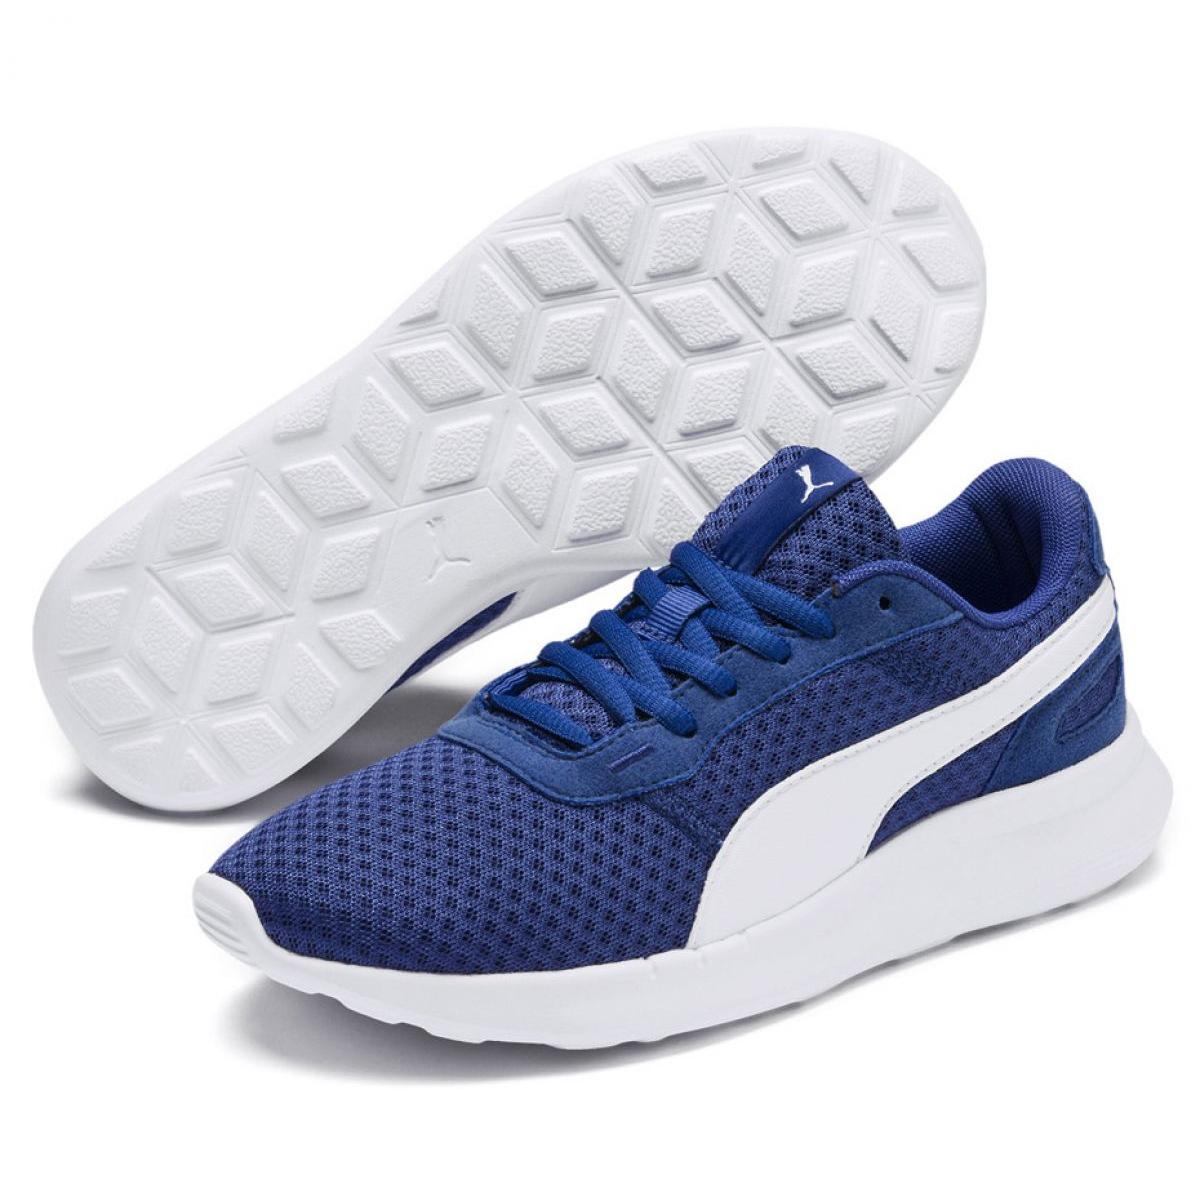 Puma 369069 Activate Bleu Jr Chaussures St 08 7gvbf6Yy